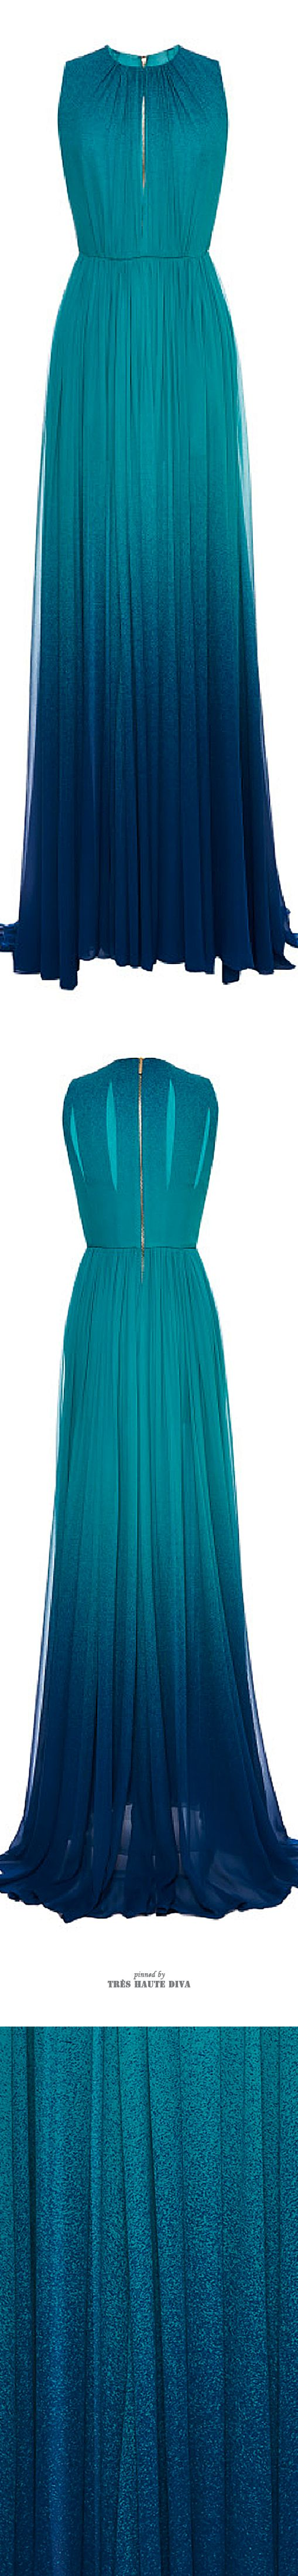 Elie Saab Turquoise Degrade Silk Georgette Dress ♔ SS 2015